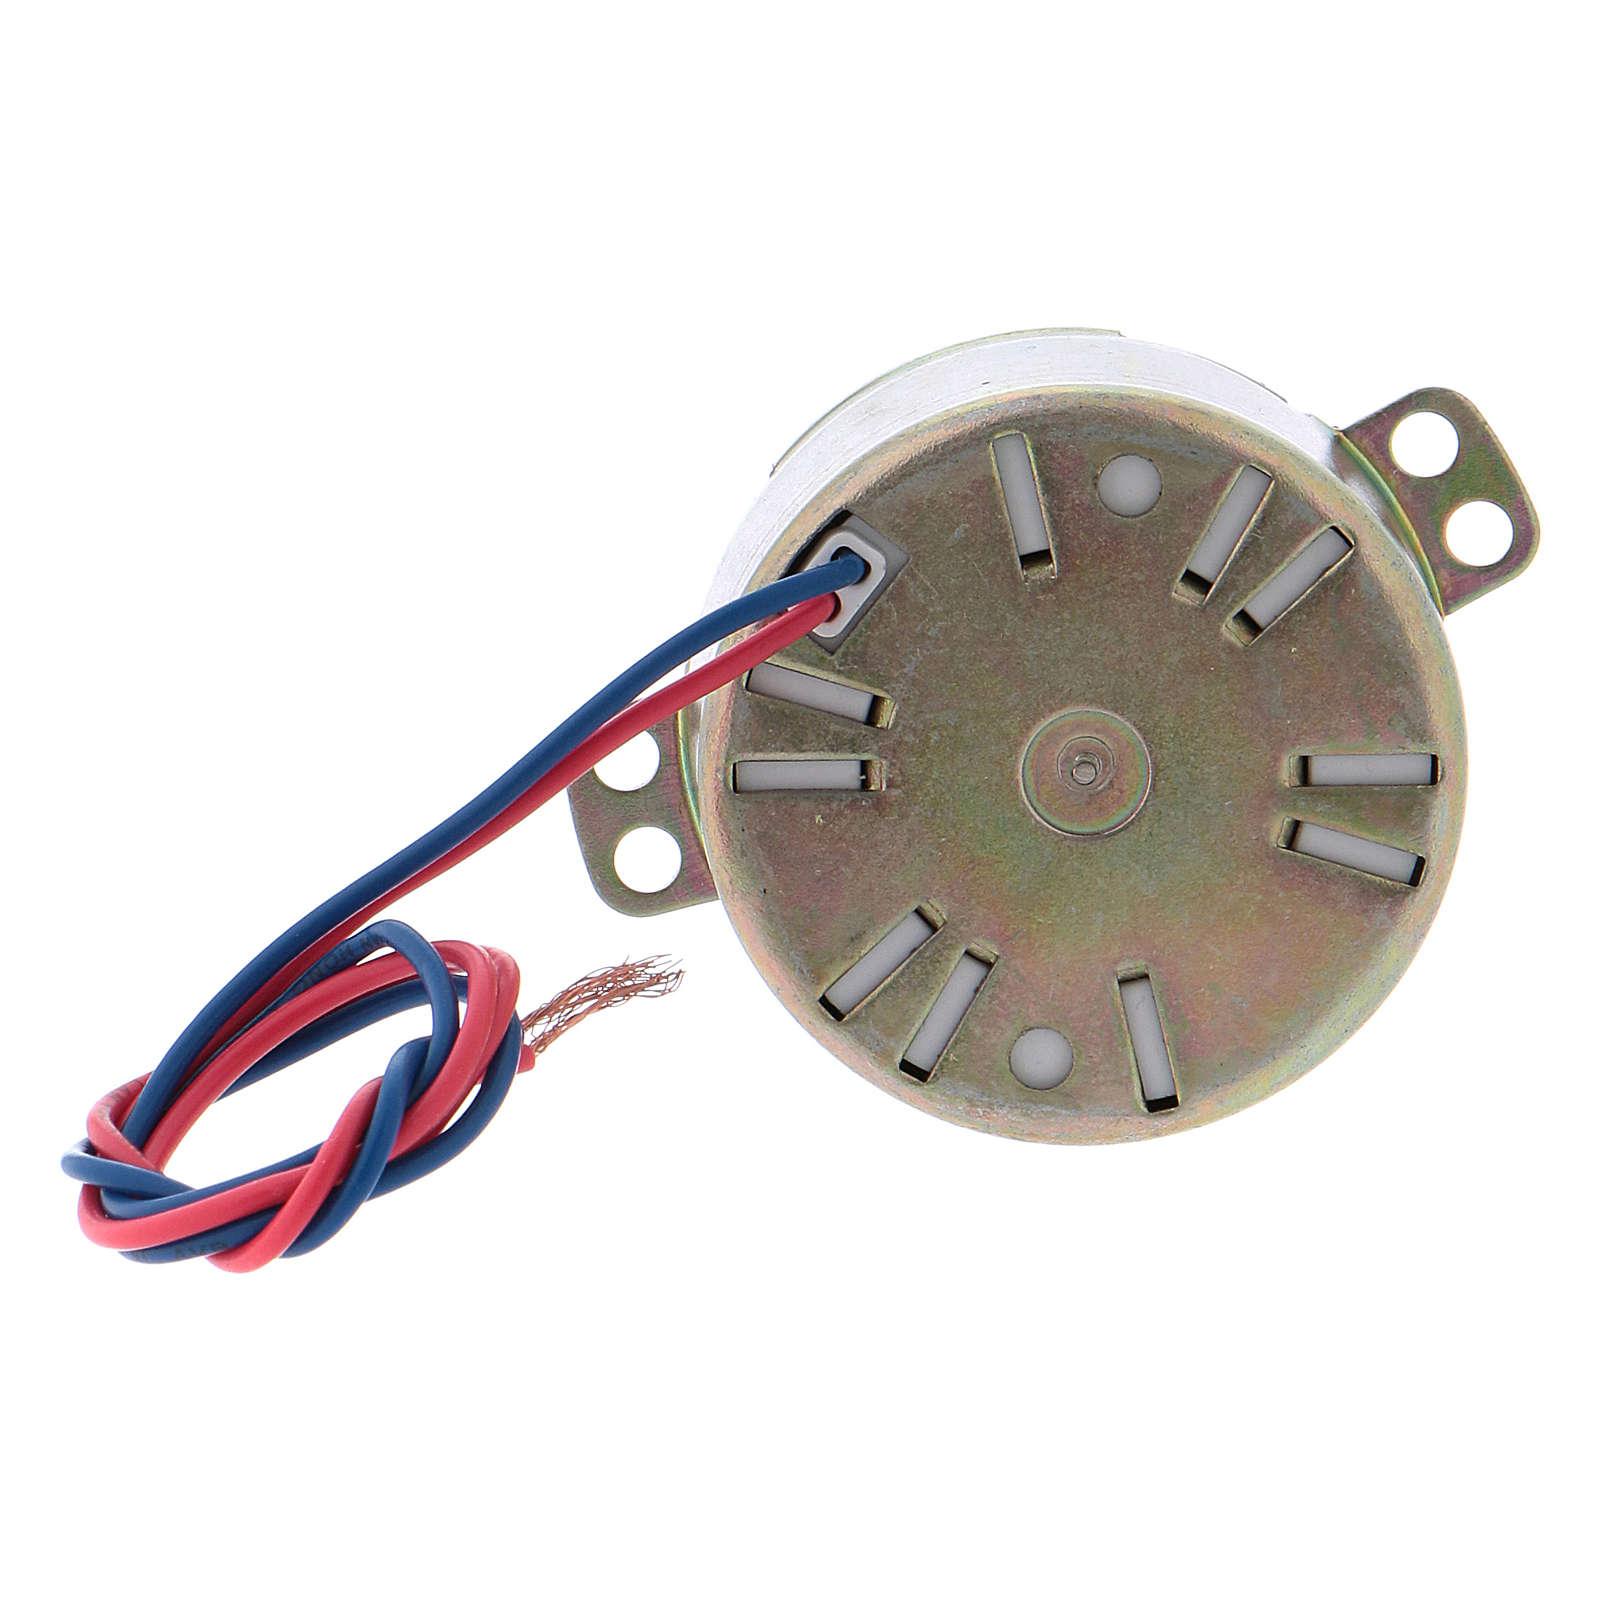 Nativity accessory, ME gear motor, 15 t/m 4